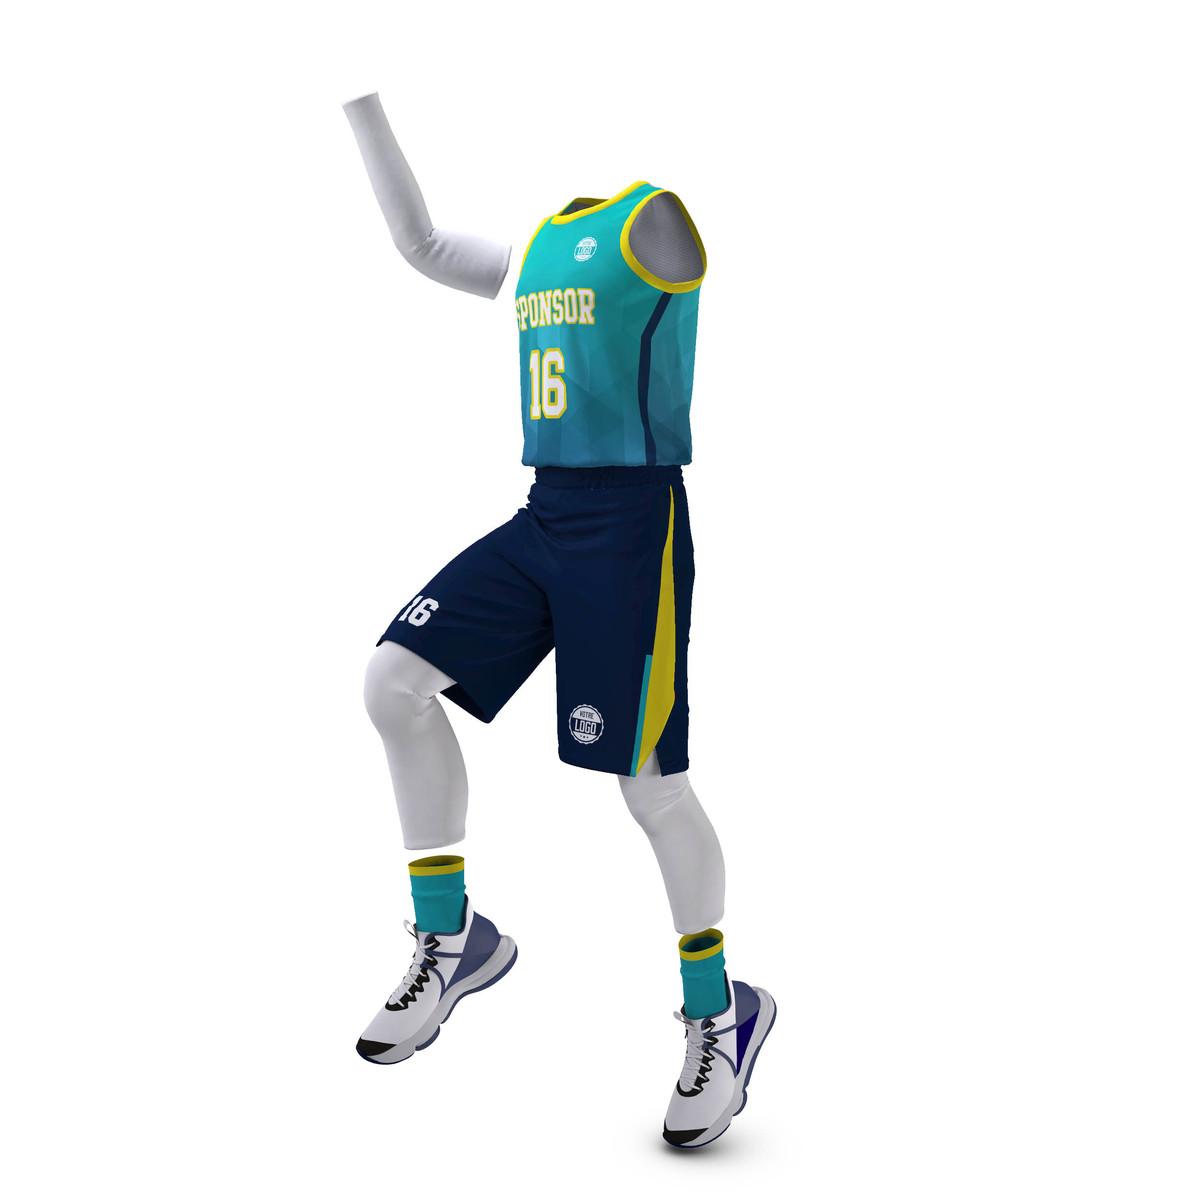 Image_basketball-16-set5-v2--0-0--962e09d0-deab-4293-bd57-f5ee517a1c18